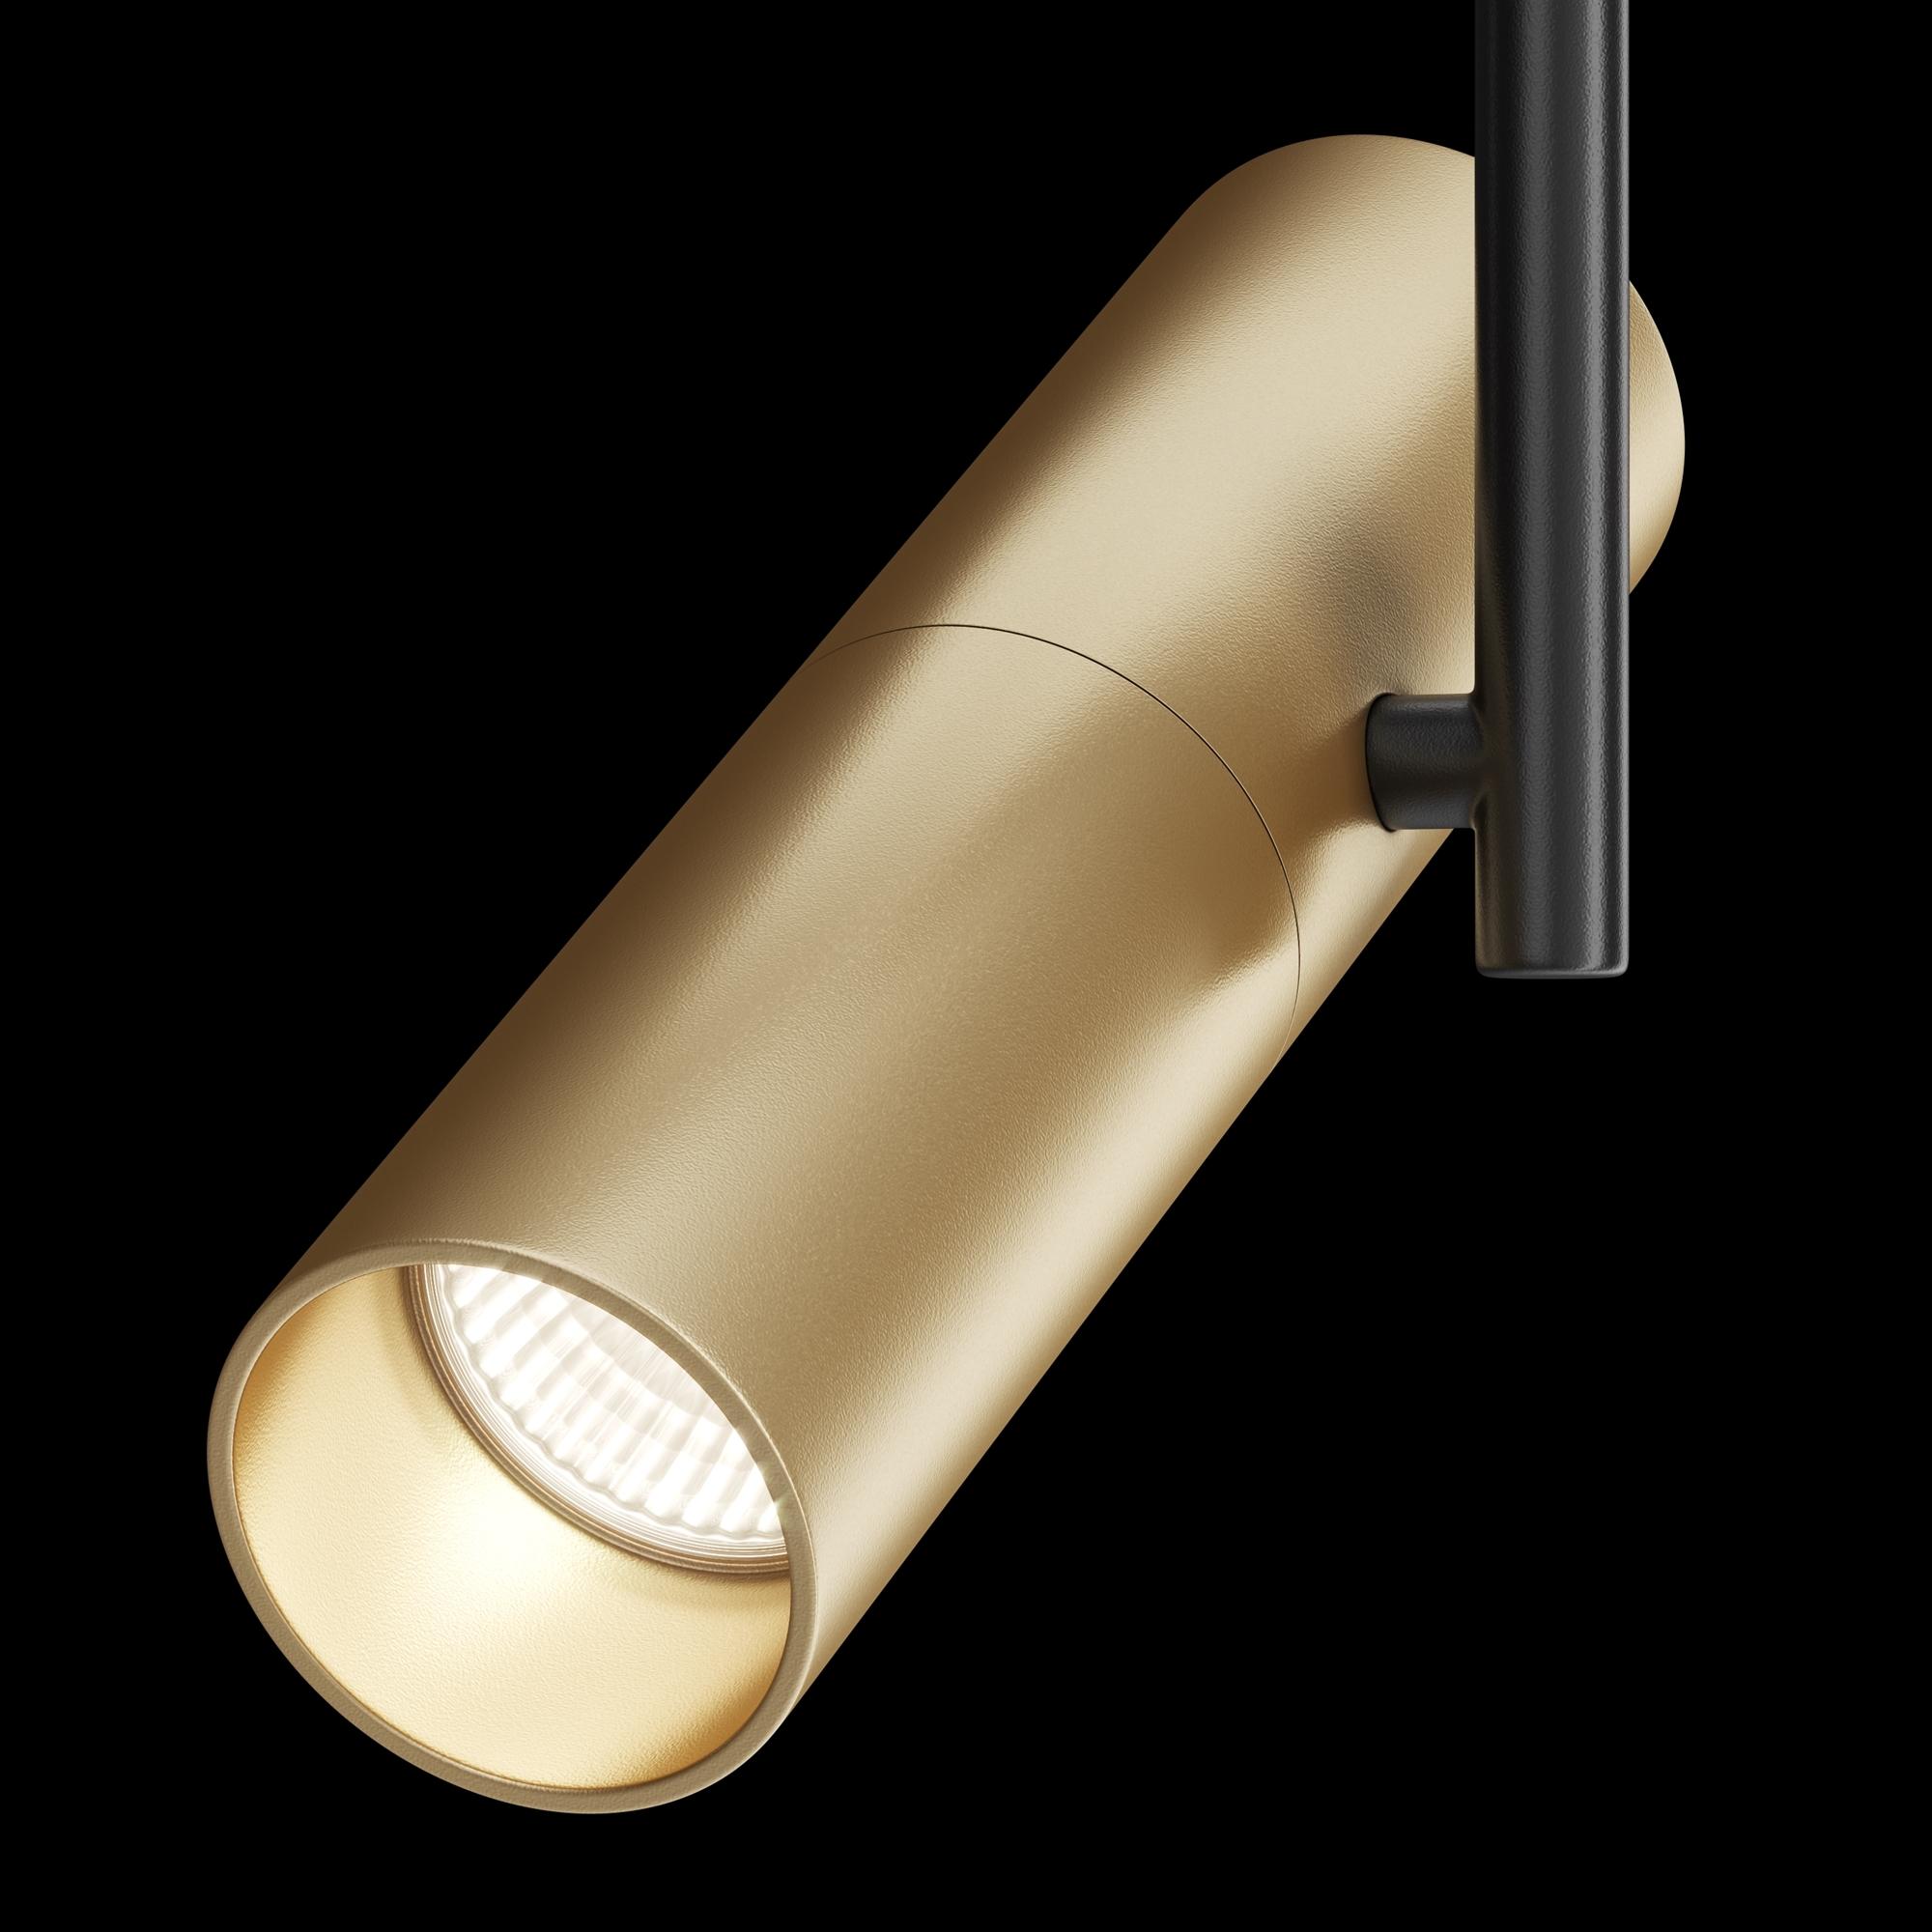 Светильник Maytoni Elti TR005-1-GU10-BG, 1xGU10x50W, черный, золото, металл - фото 3